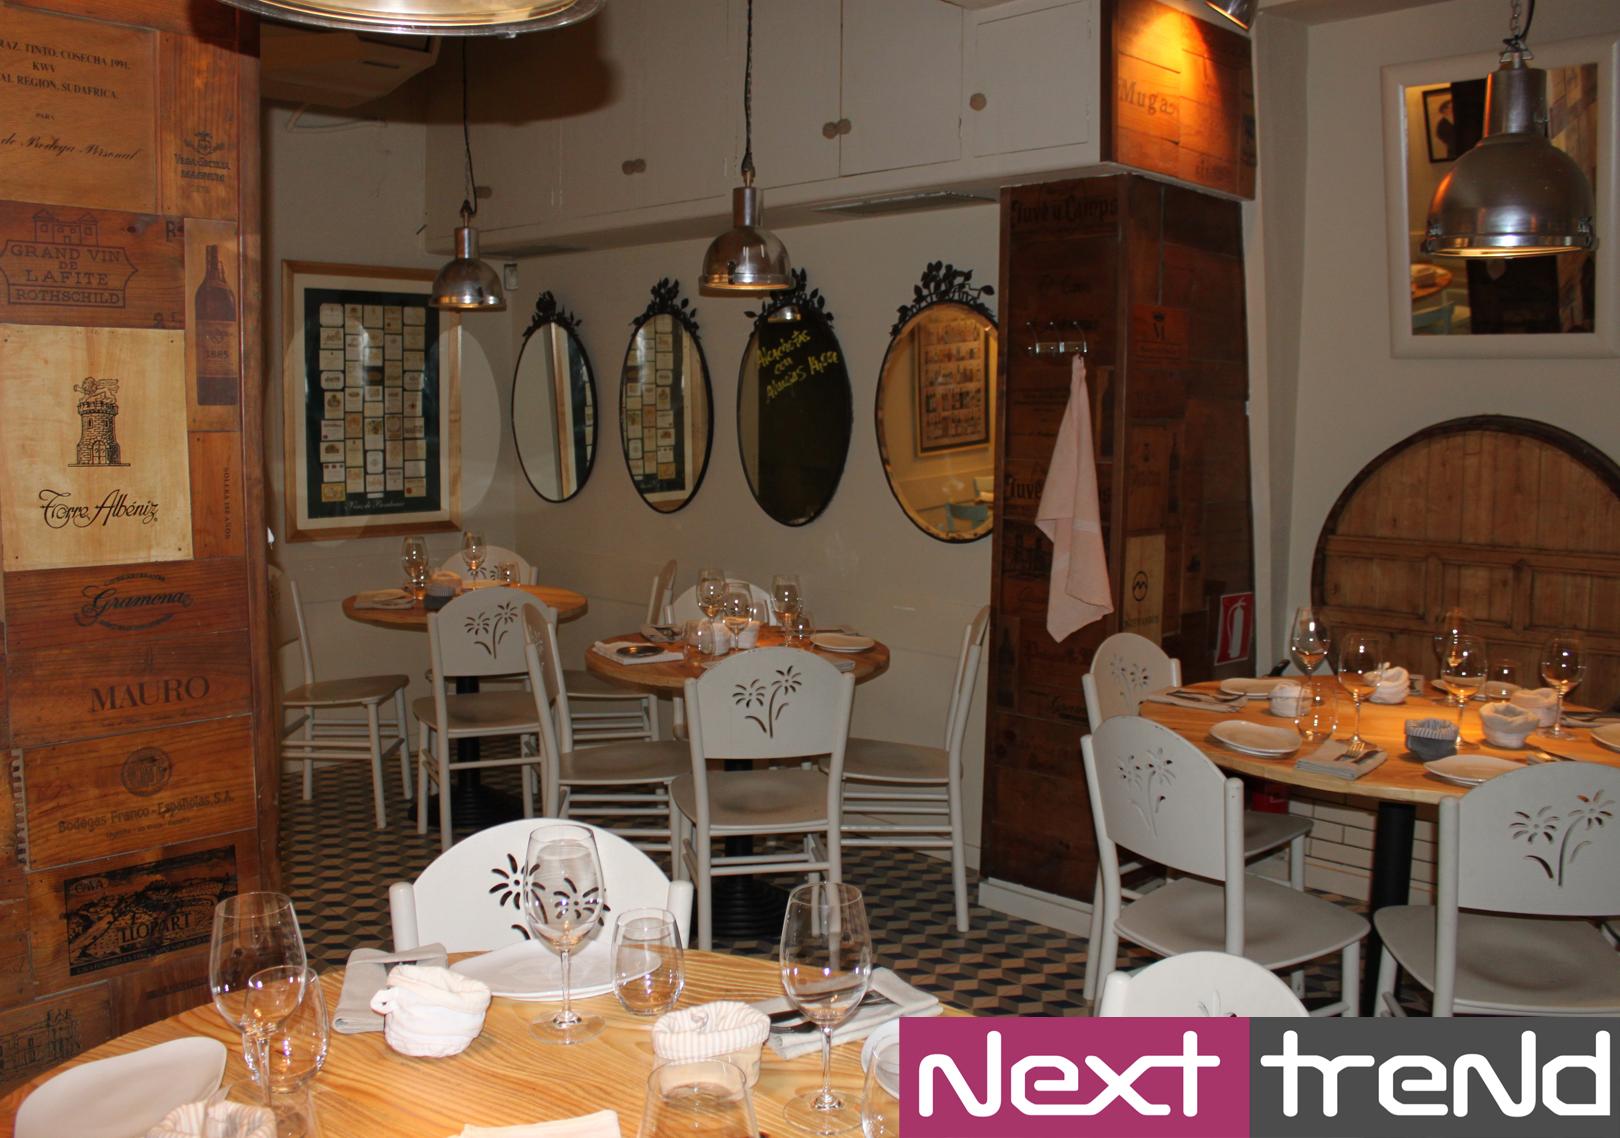 restaurant-carlota-manu-isabel-nunez-nextic-nexttrend